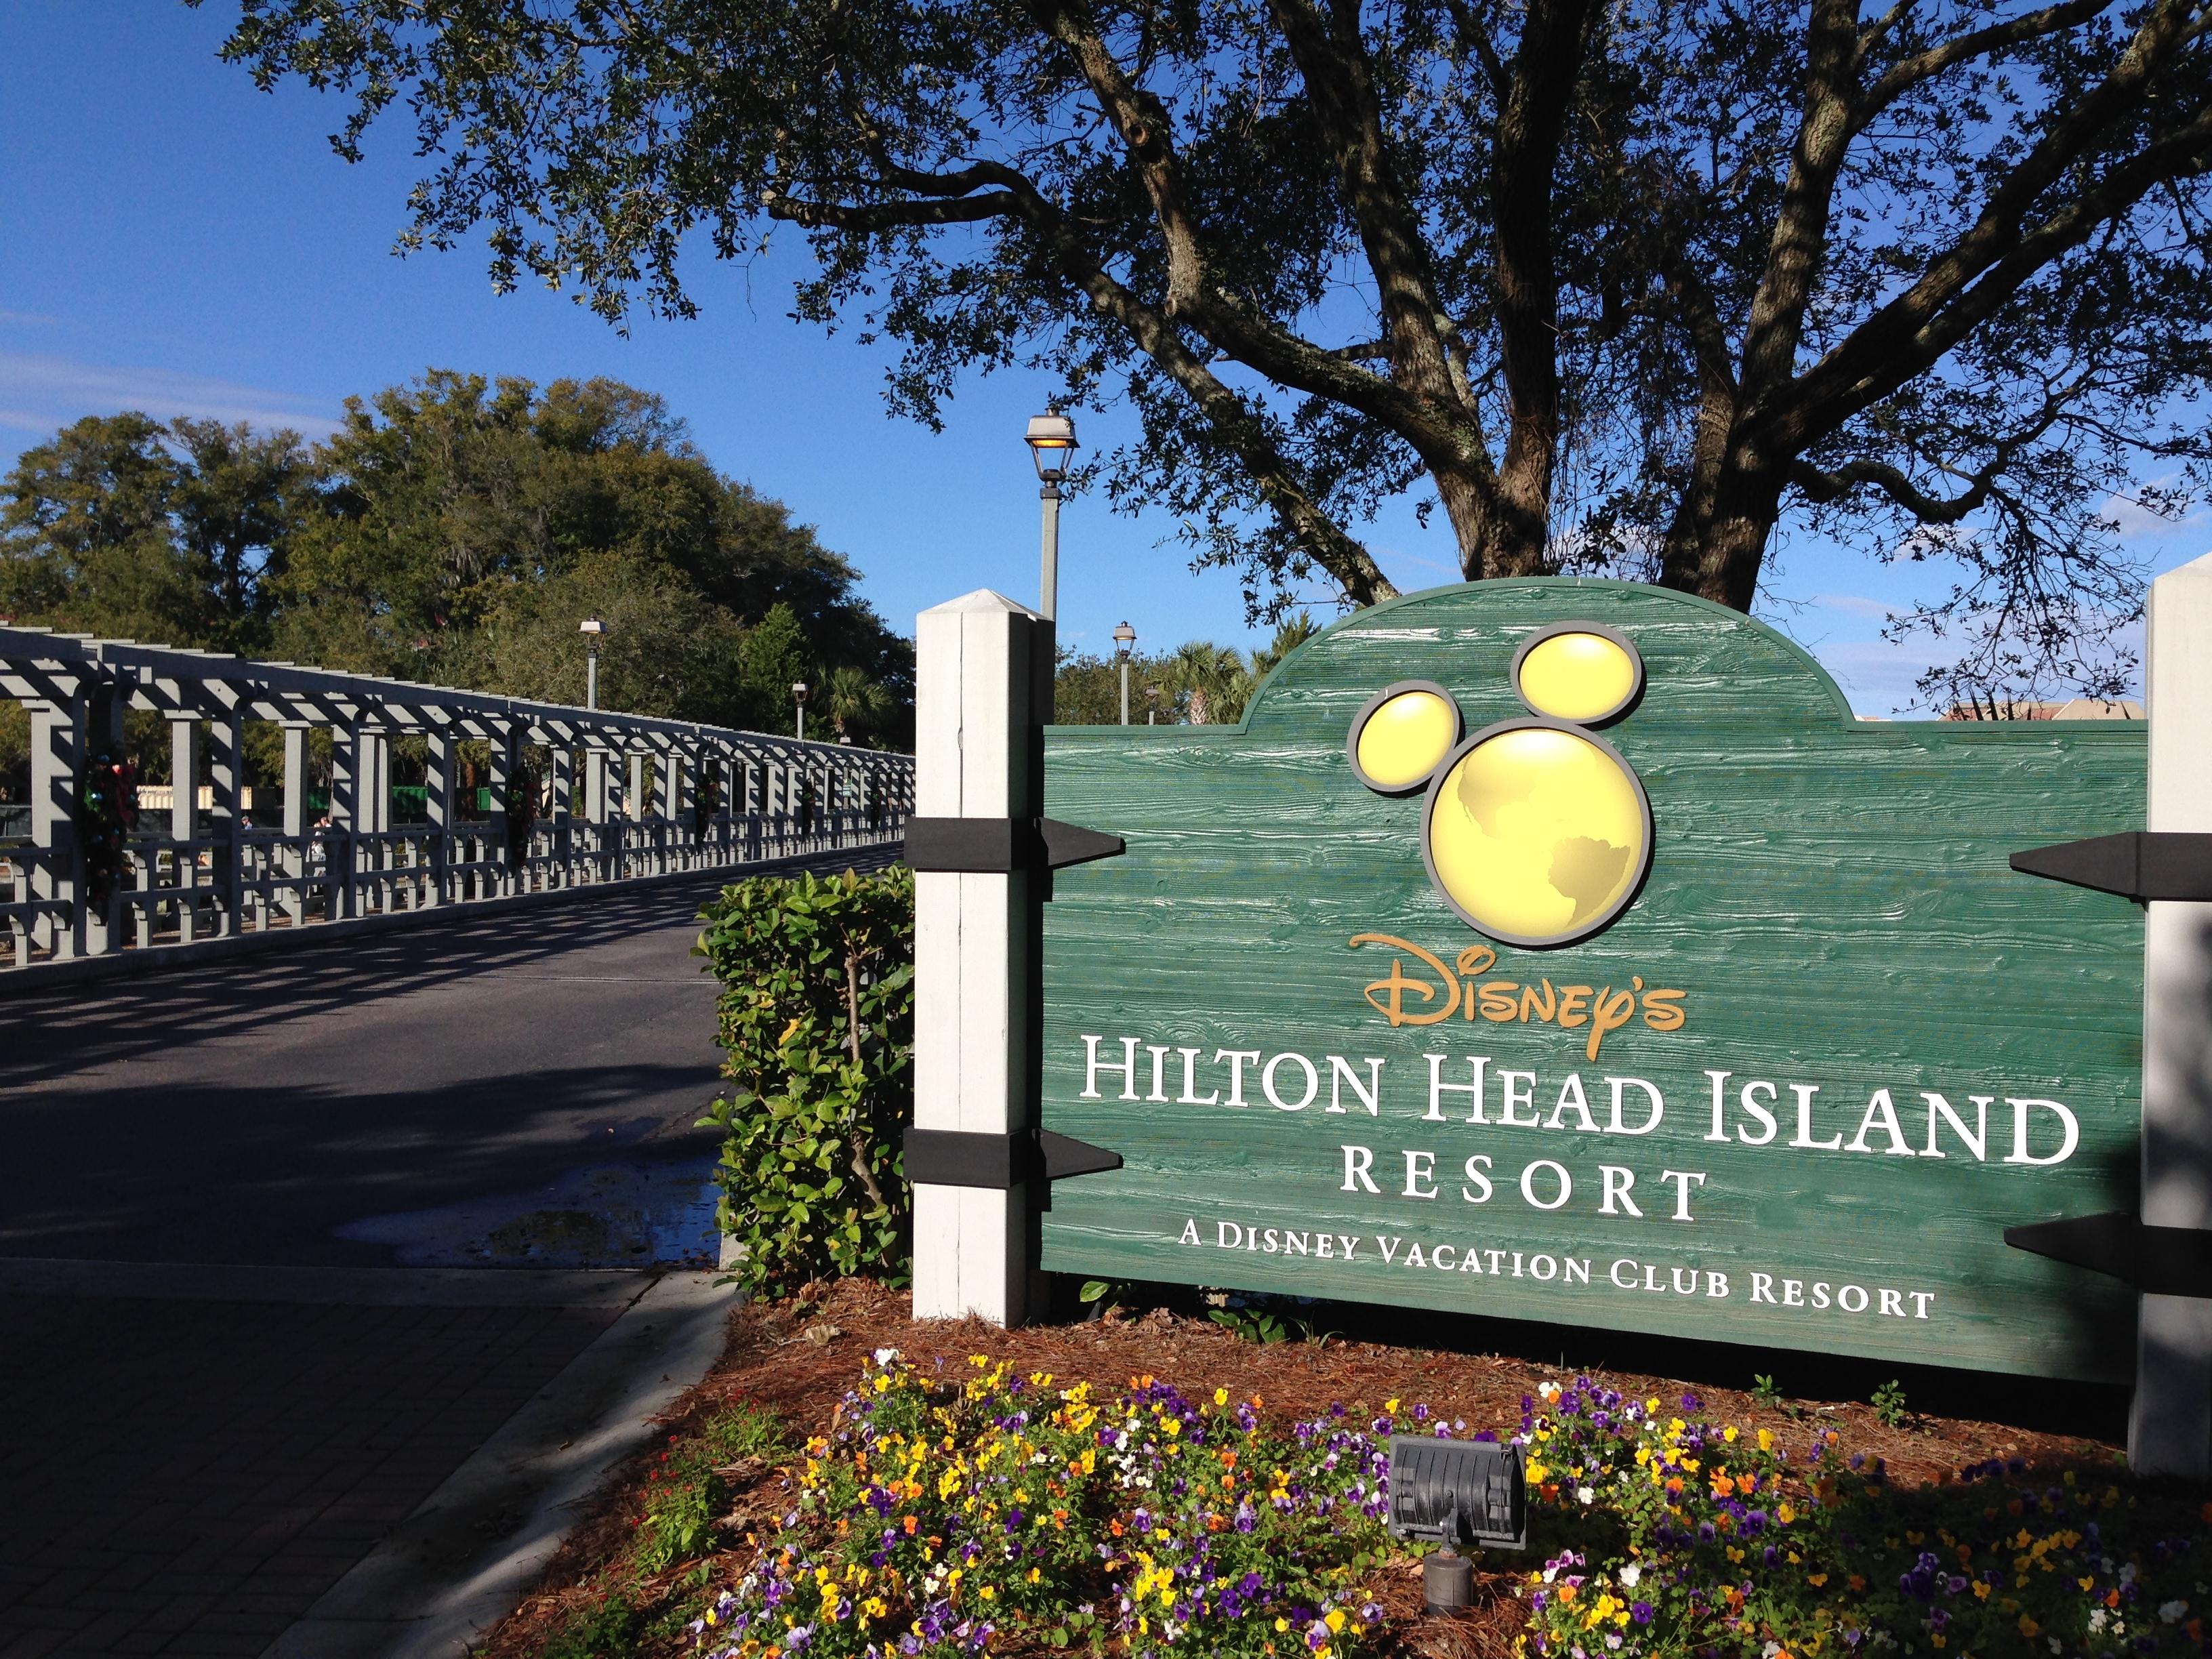 disney's hilton head island resort trip report - disney pins blog